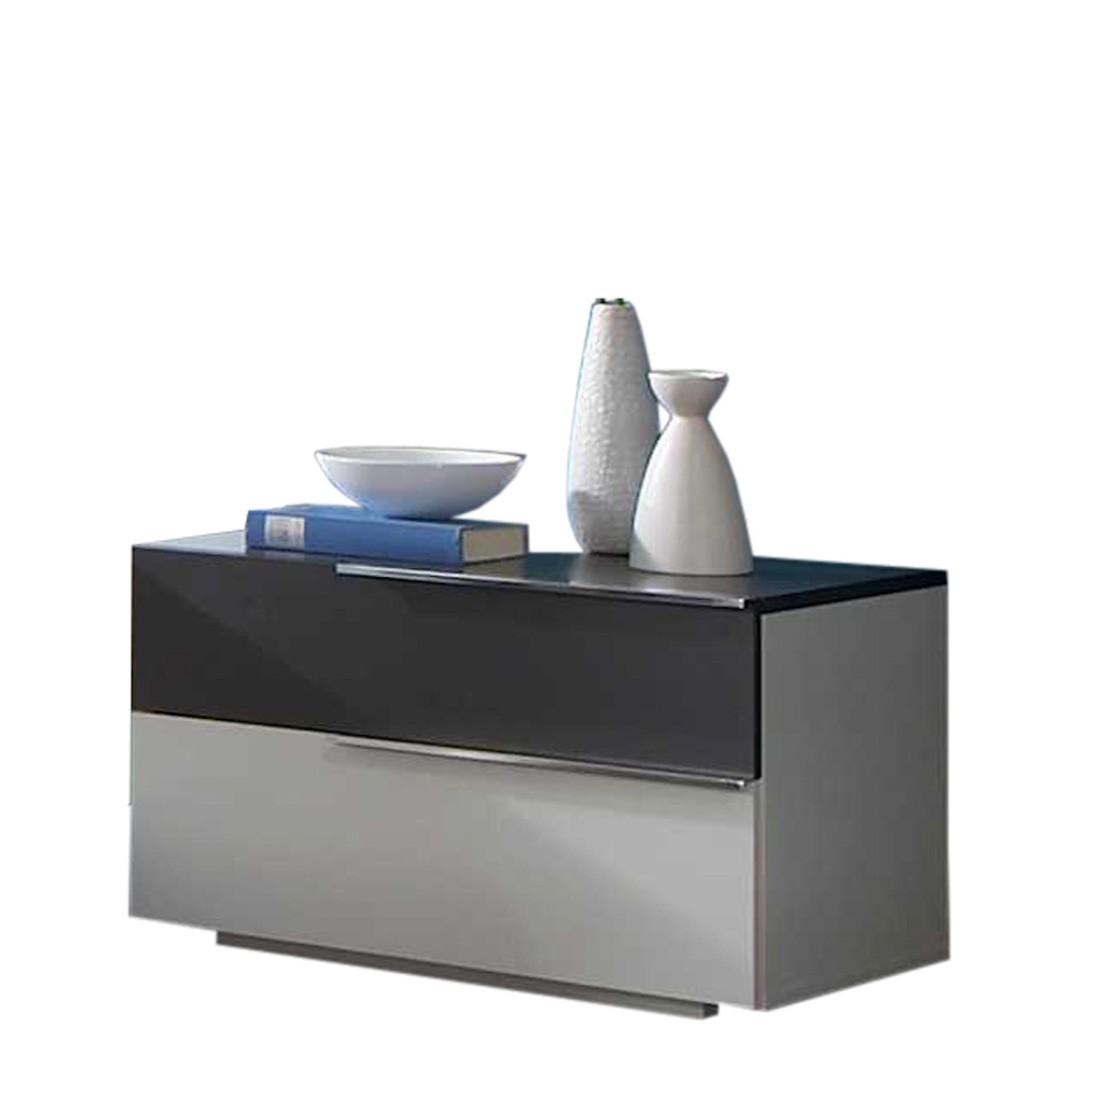 nachtschrank funky alpinwei fraktalglas anthrazit 2. Black Bedroom Furniture Sets. Home Design Ideas